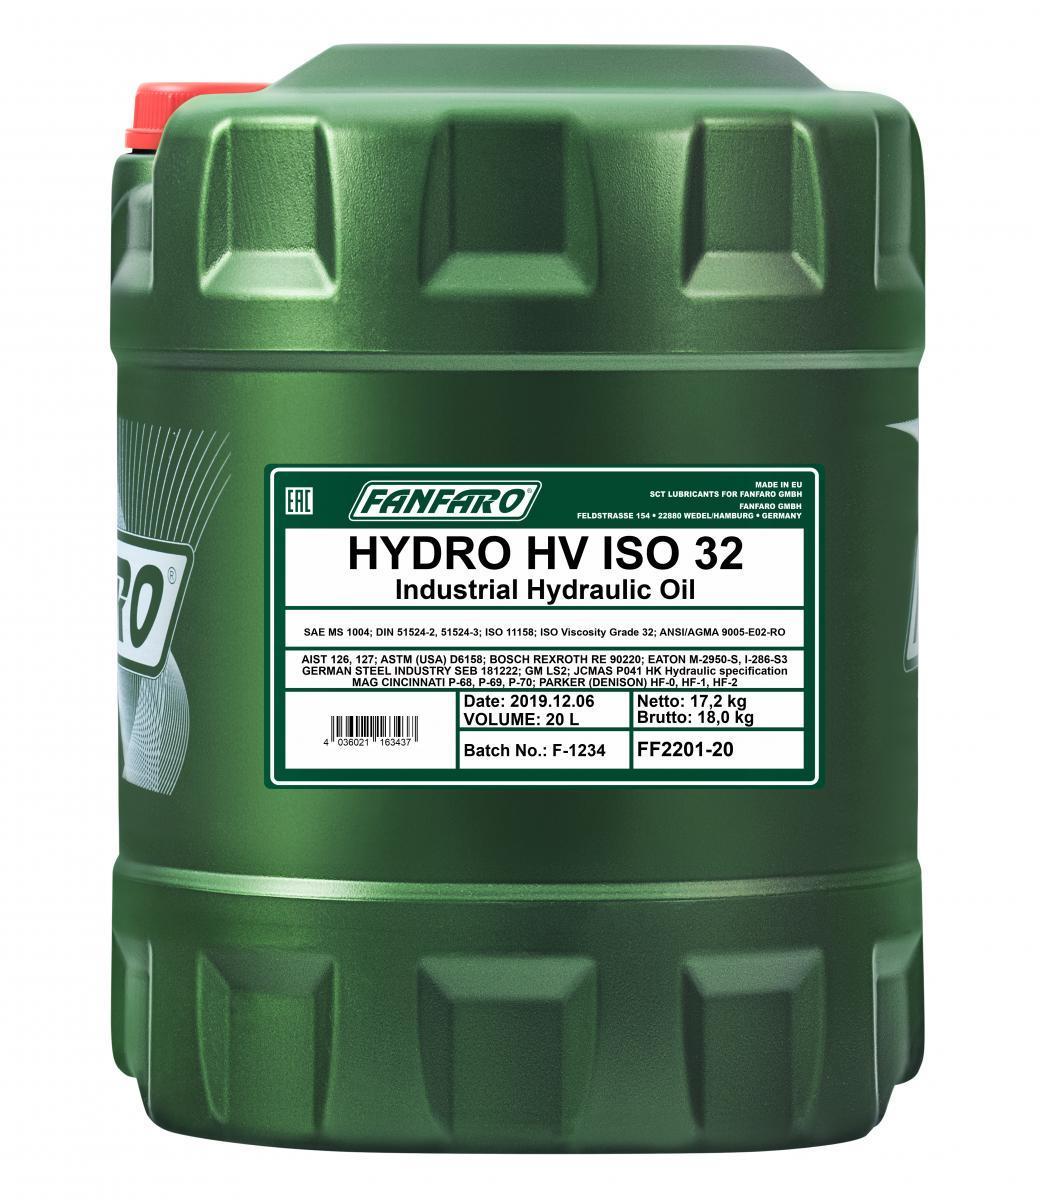 Koop FANFARO Hydraulische olie FF2201-20 vrachtwagen